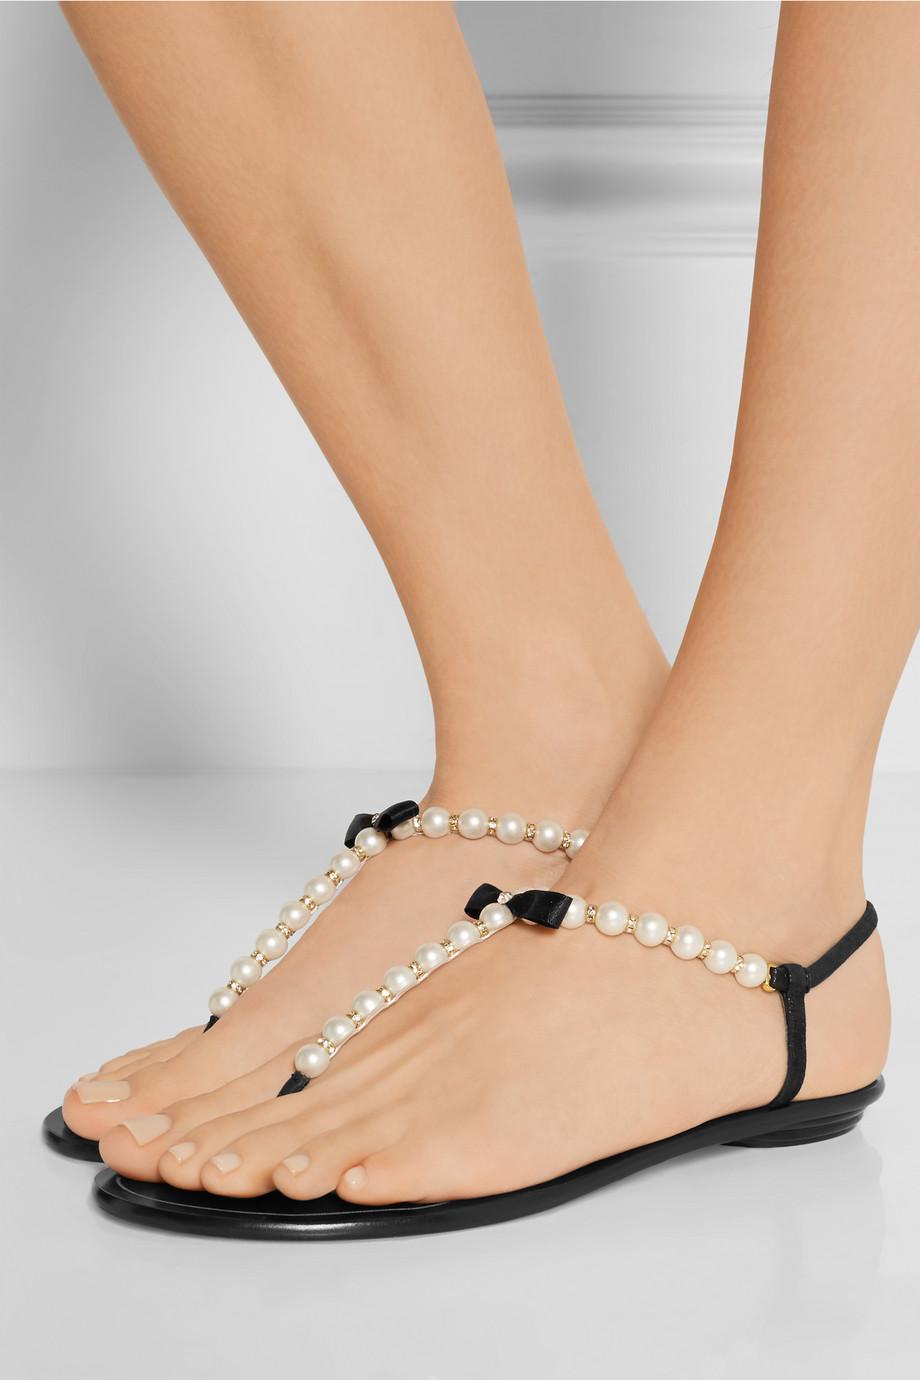 René Caovilla Embellished leather sandals